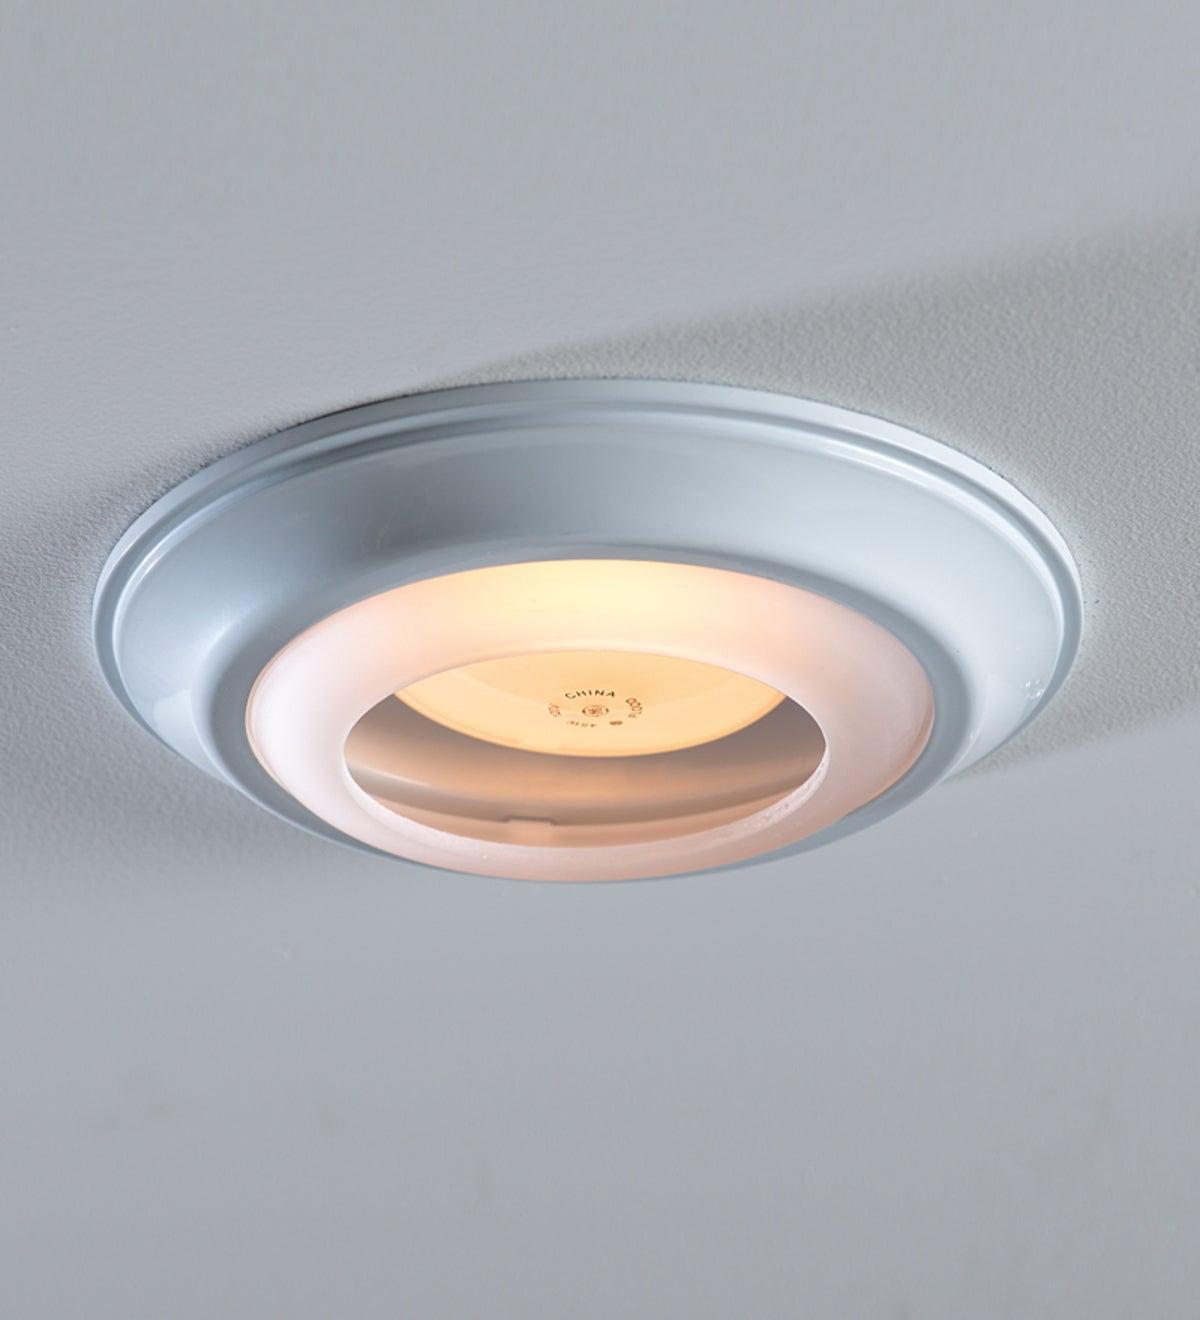 Simple Trim Recessed Light Cap Ring | Lamps & Lighting | Home ...